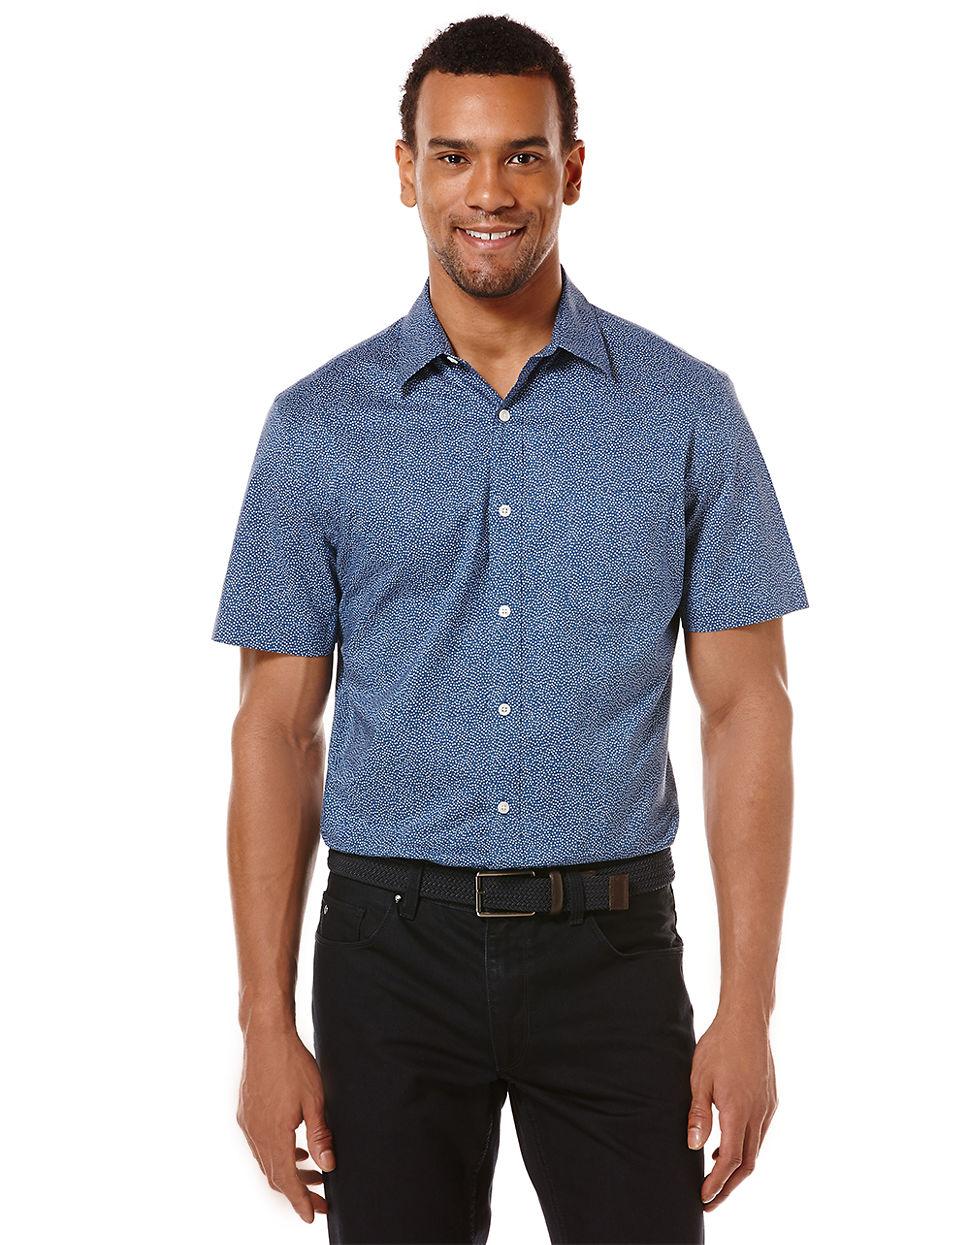 Perry Ellis Slim Fit Uneven Tile Dress Shirt In